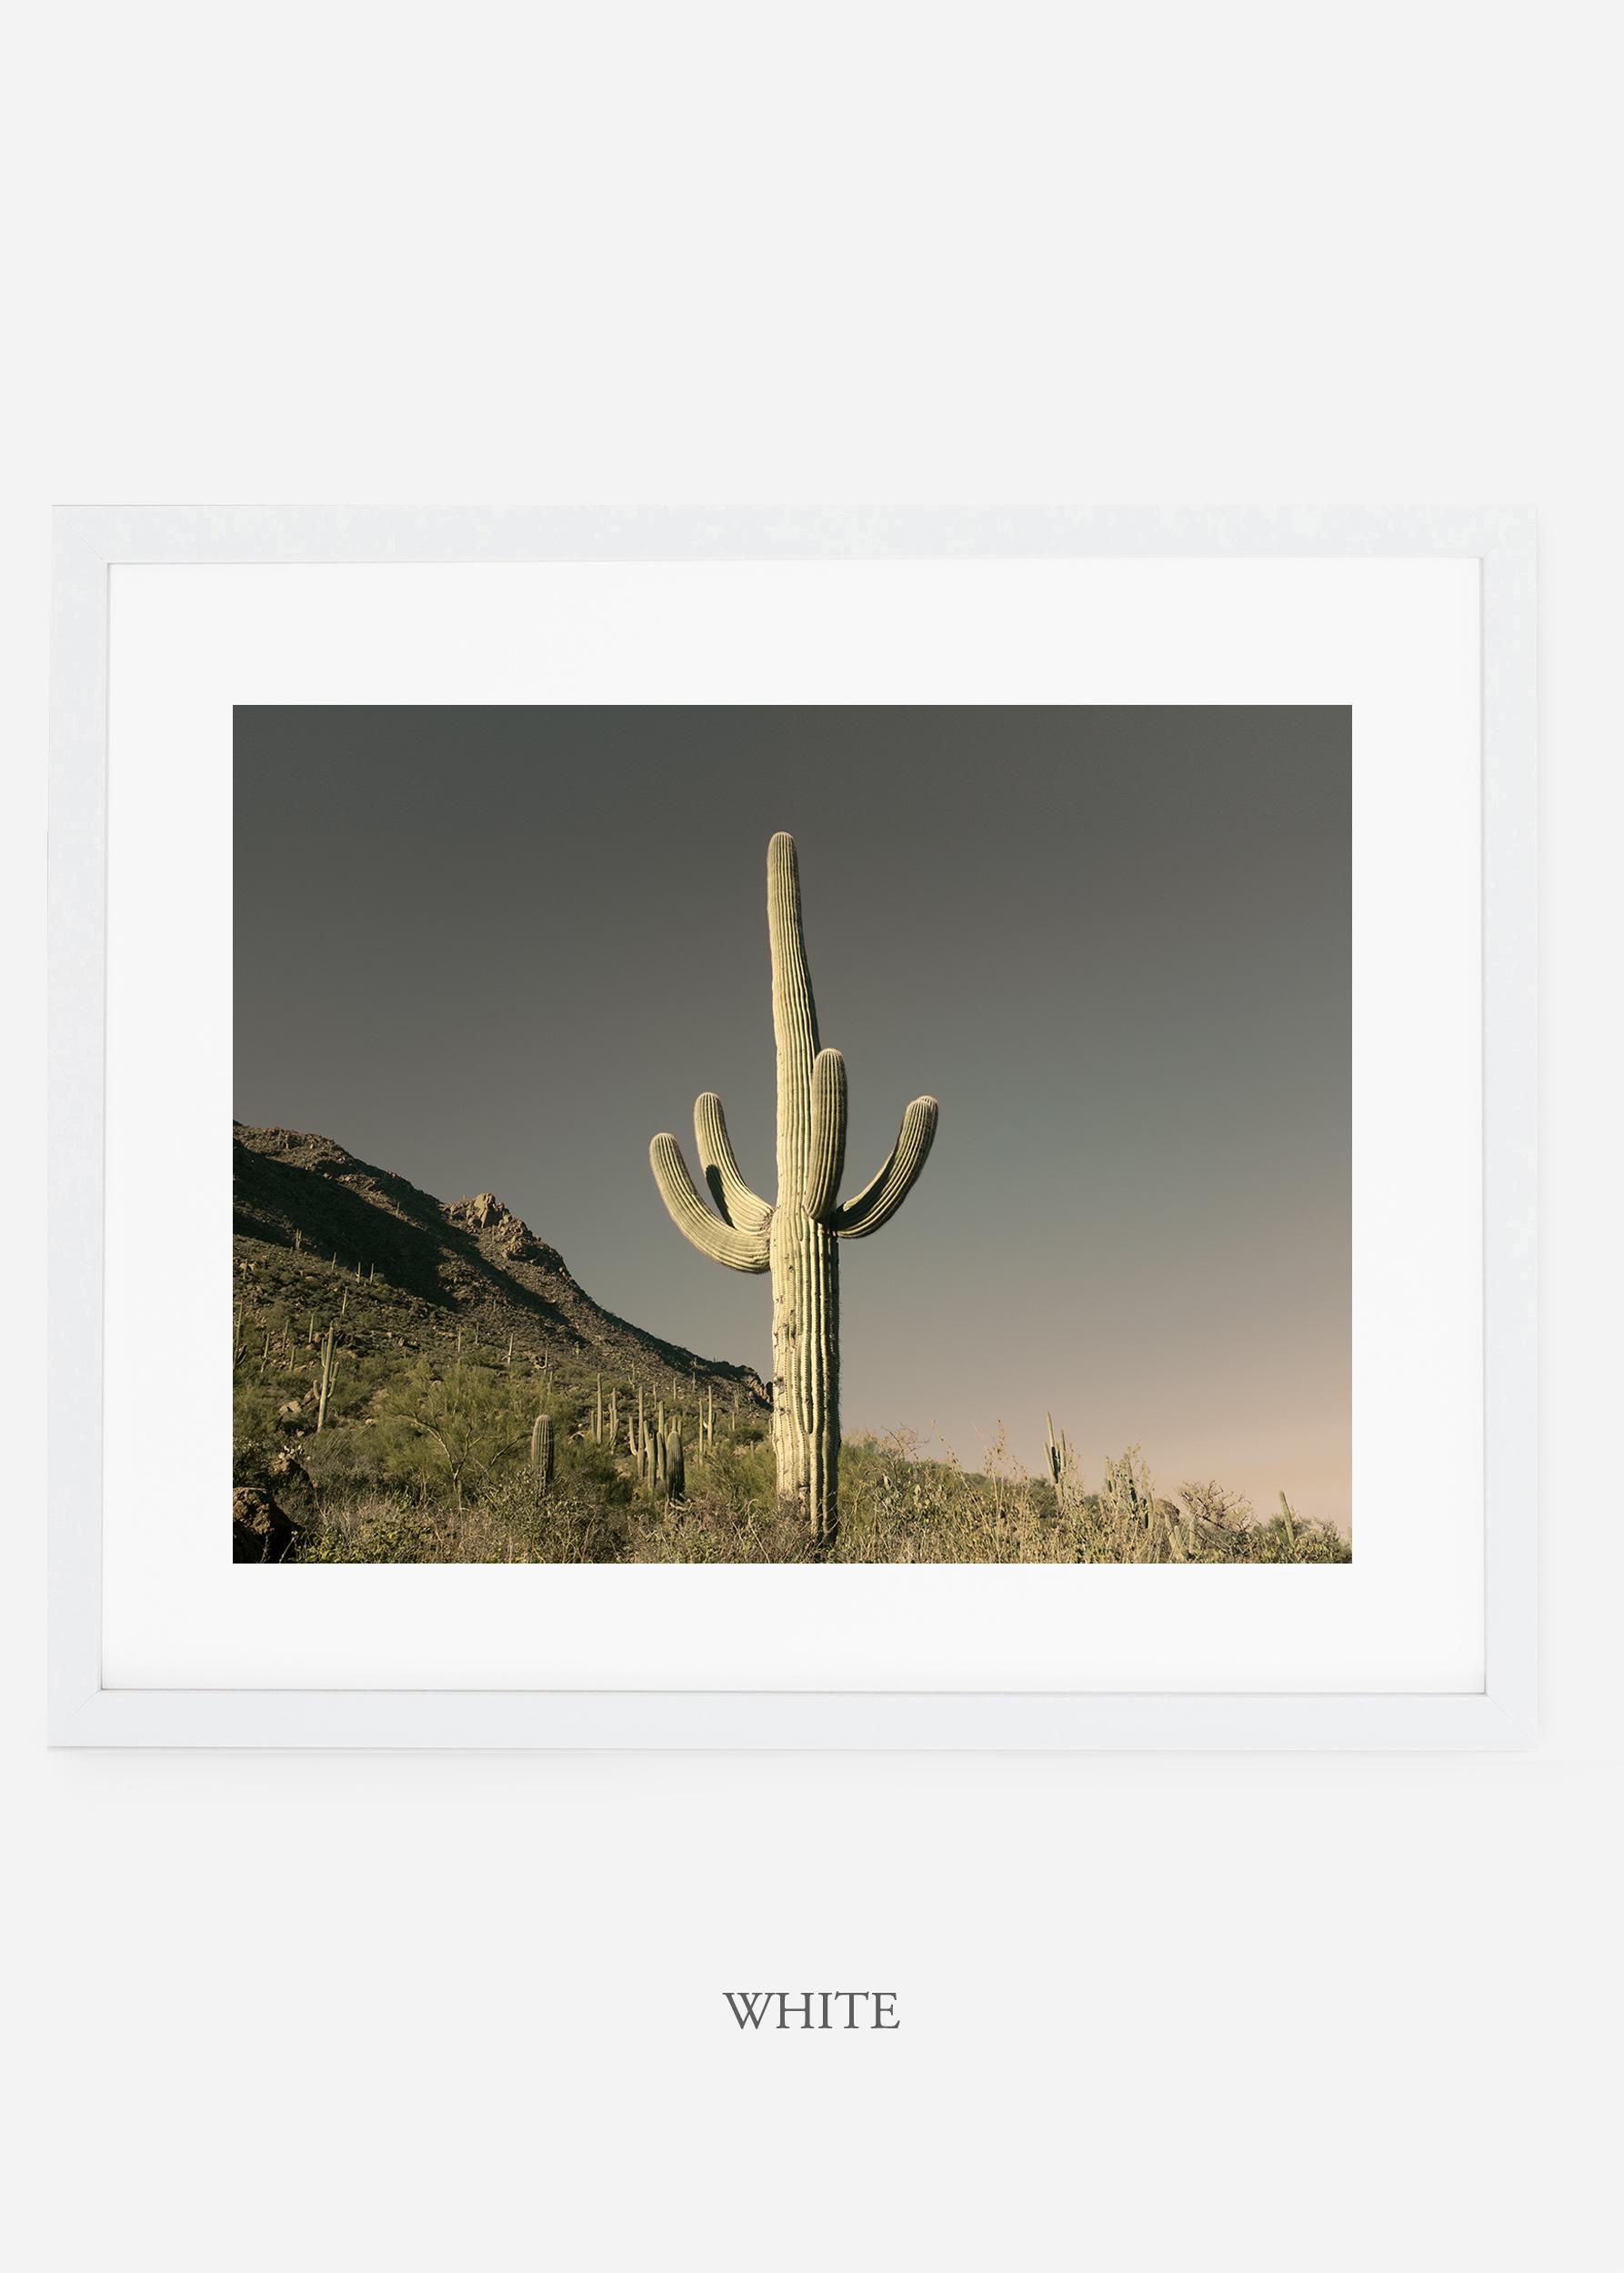 whiteframe-saguaroNo.19-wildercalifornia-art-wallart-cactusprint-homedecor-prints-arizona-botanical-artwork-interiordesign.jpg